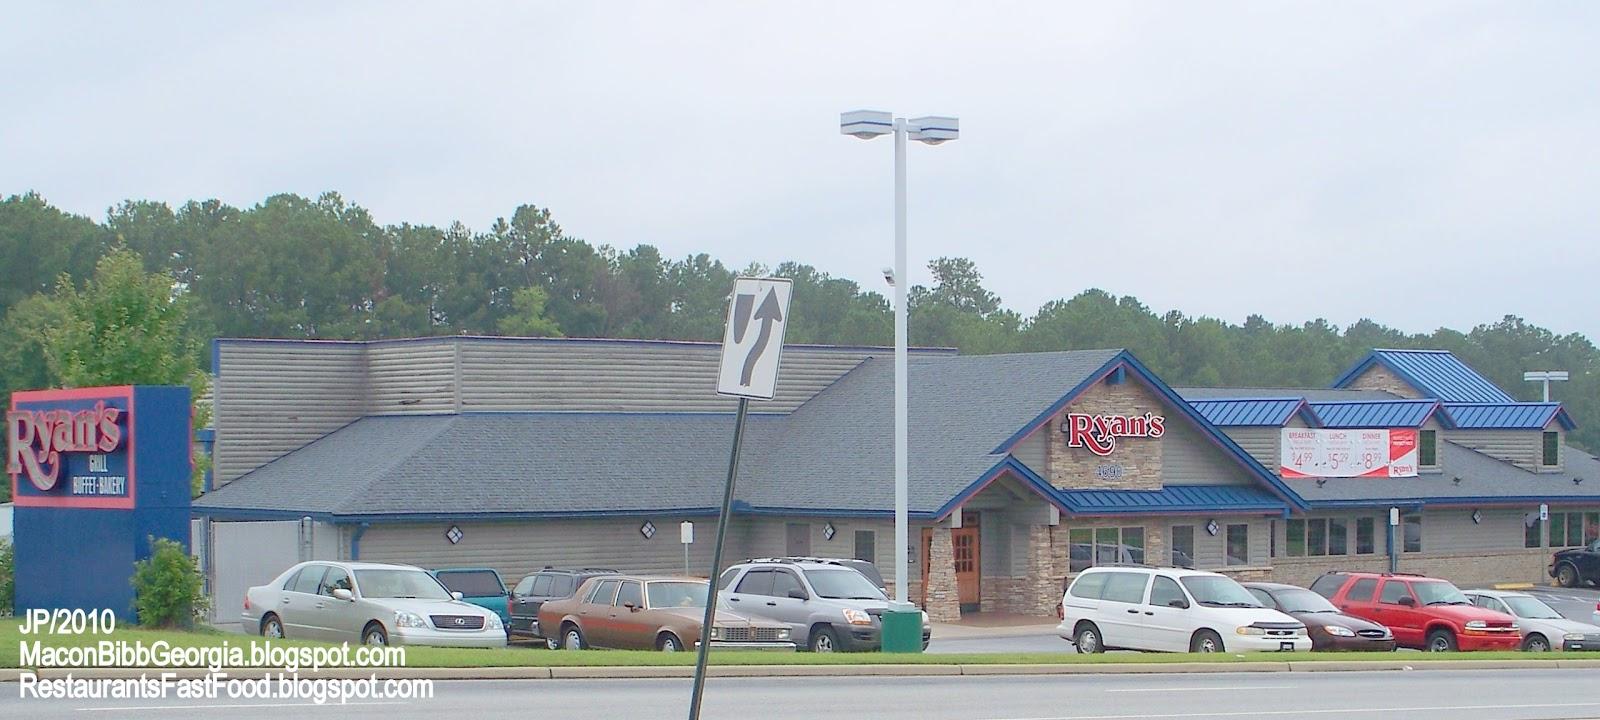 Macon Bibb Georgia Attorney College Restaurant Dr Hospital